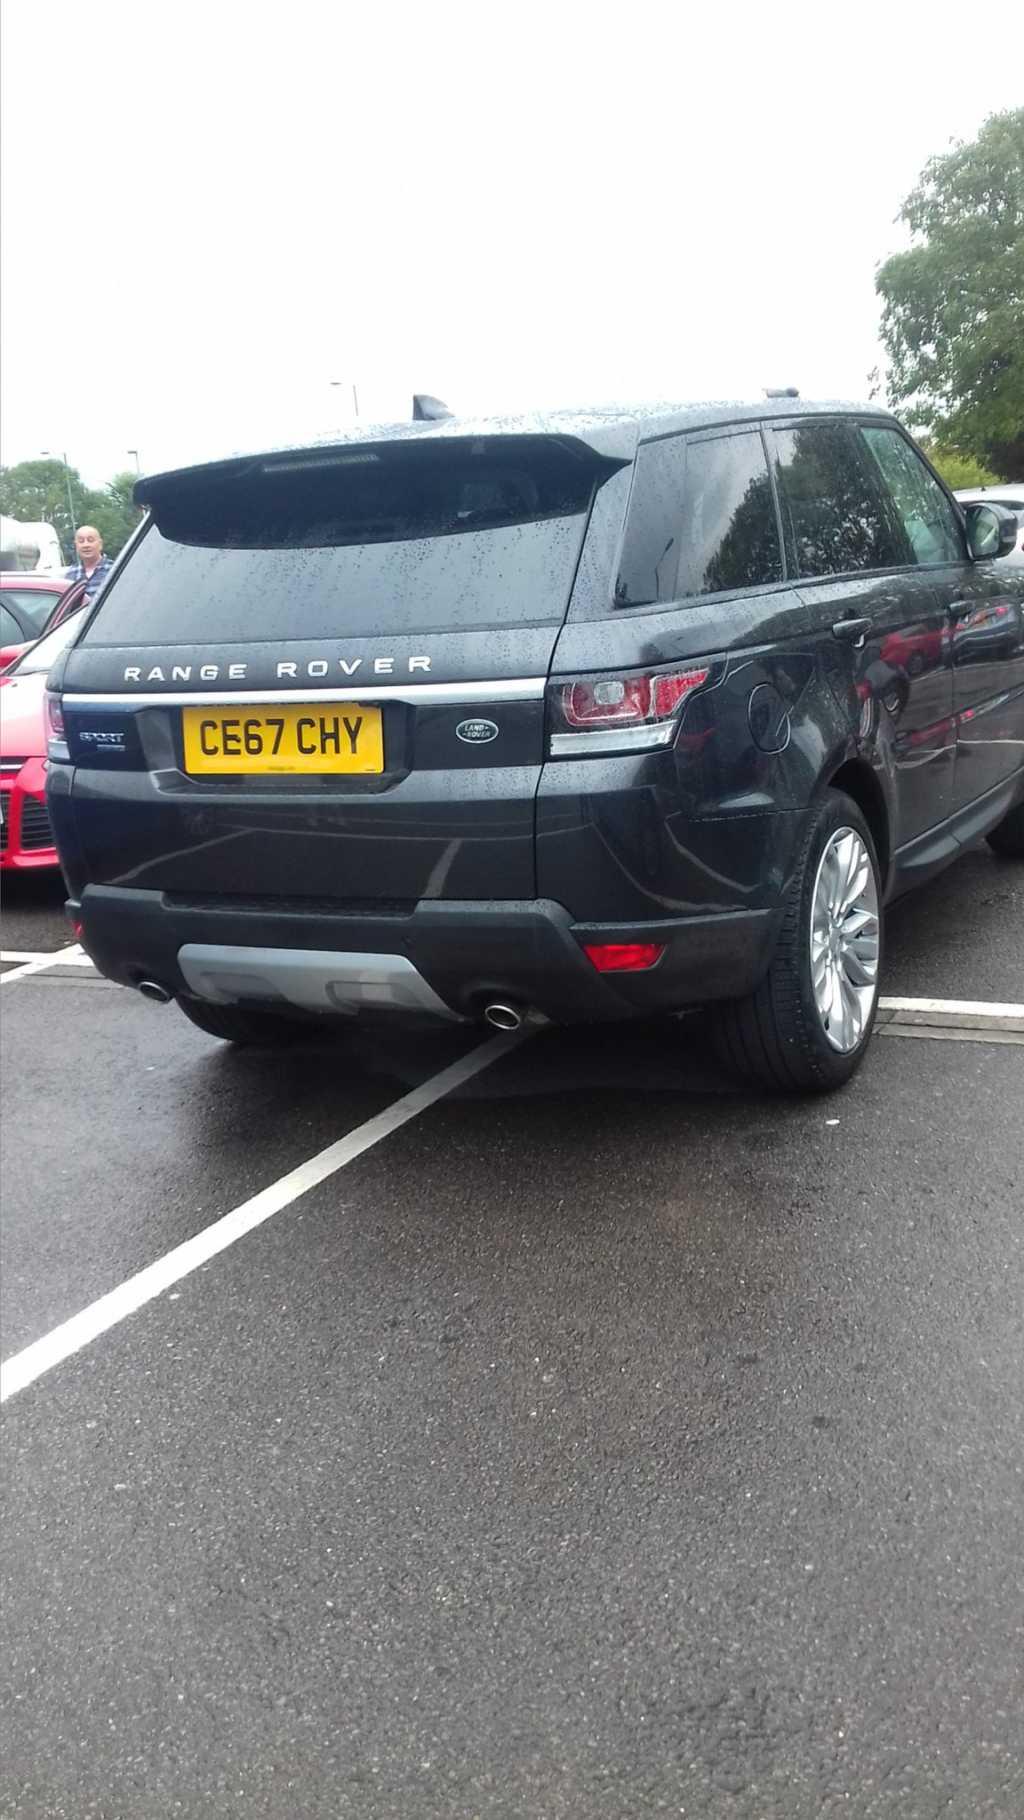 CE67 CHY displaying Selfish Parking